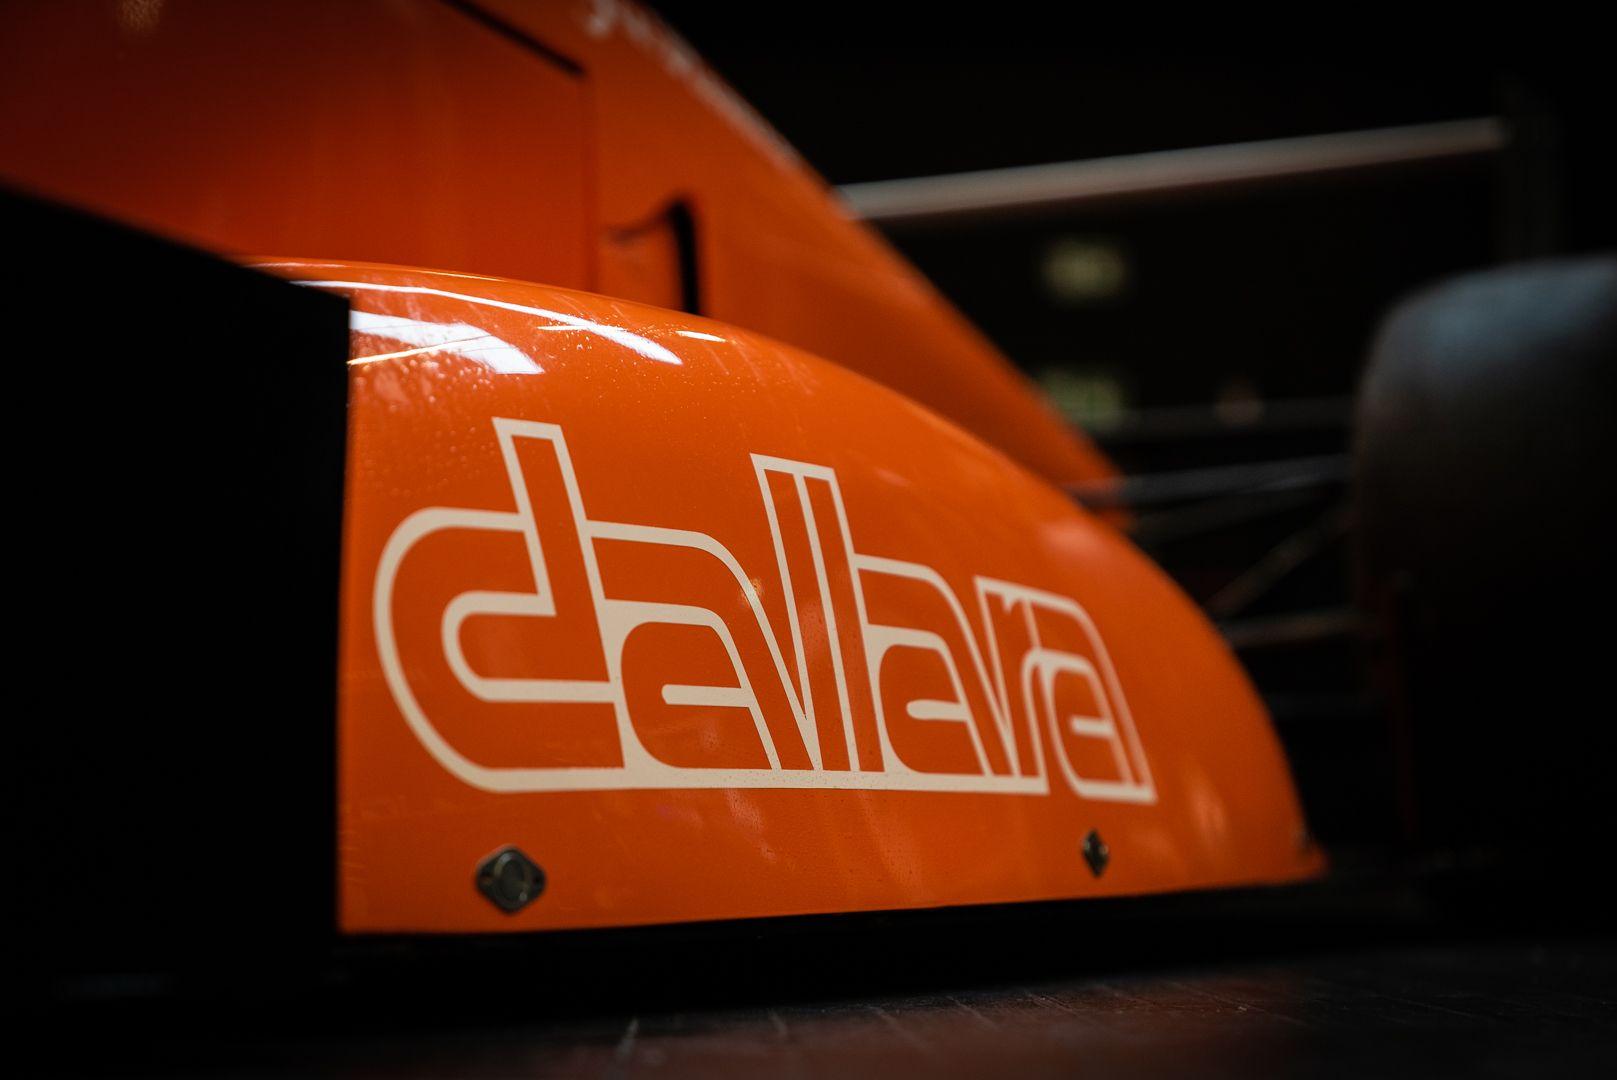 1991 Dallara Alfa Romeo Tipo 391 60417